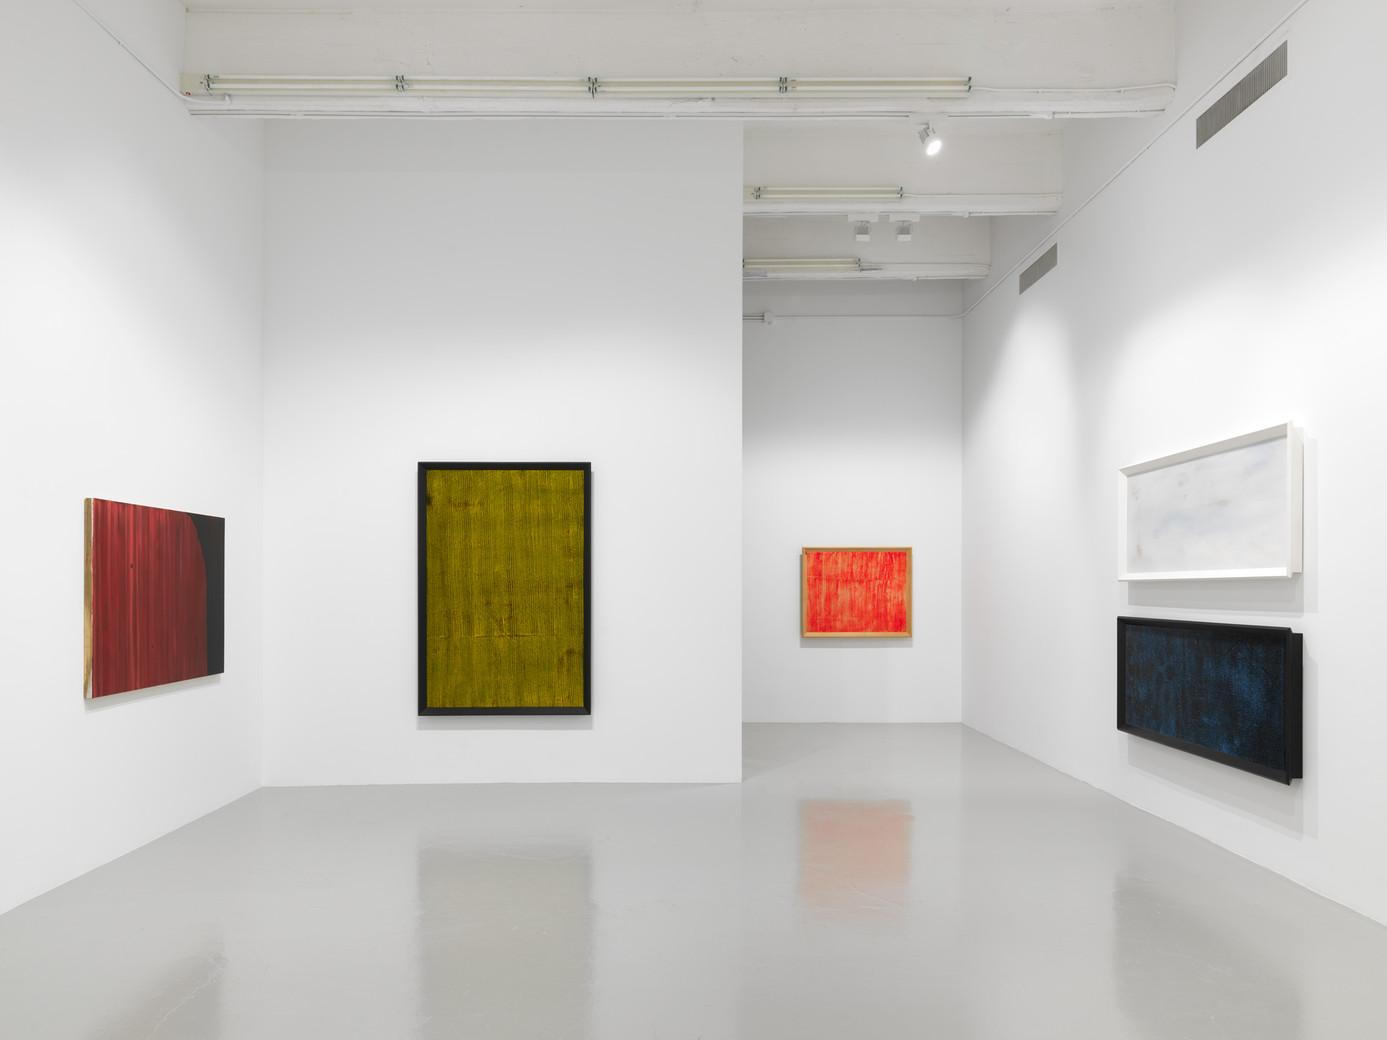 Mike Kelley / Hauser & Wirth